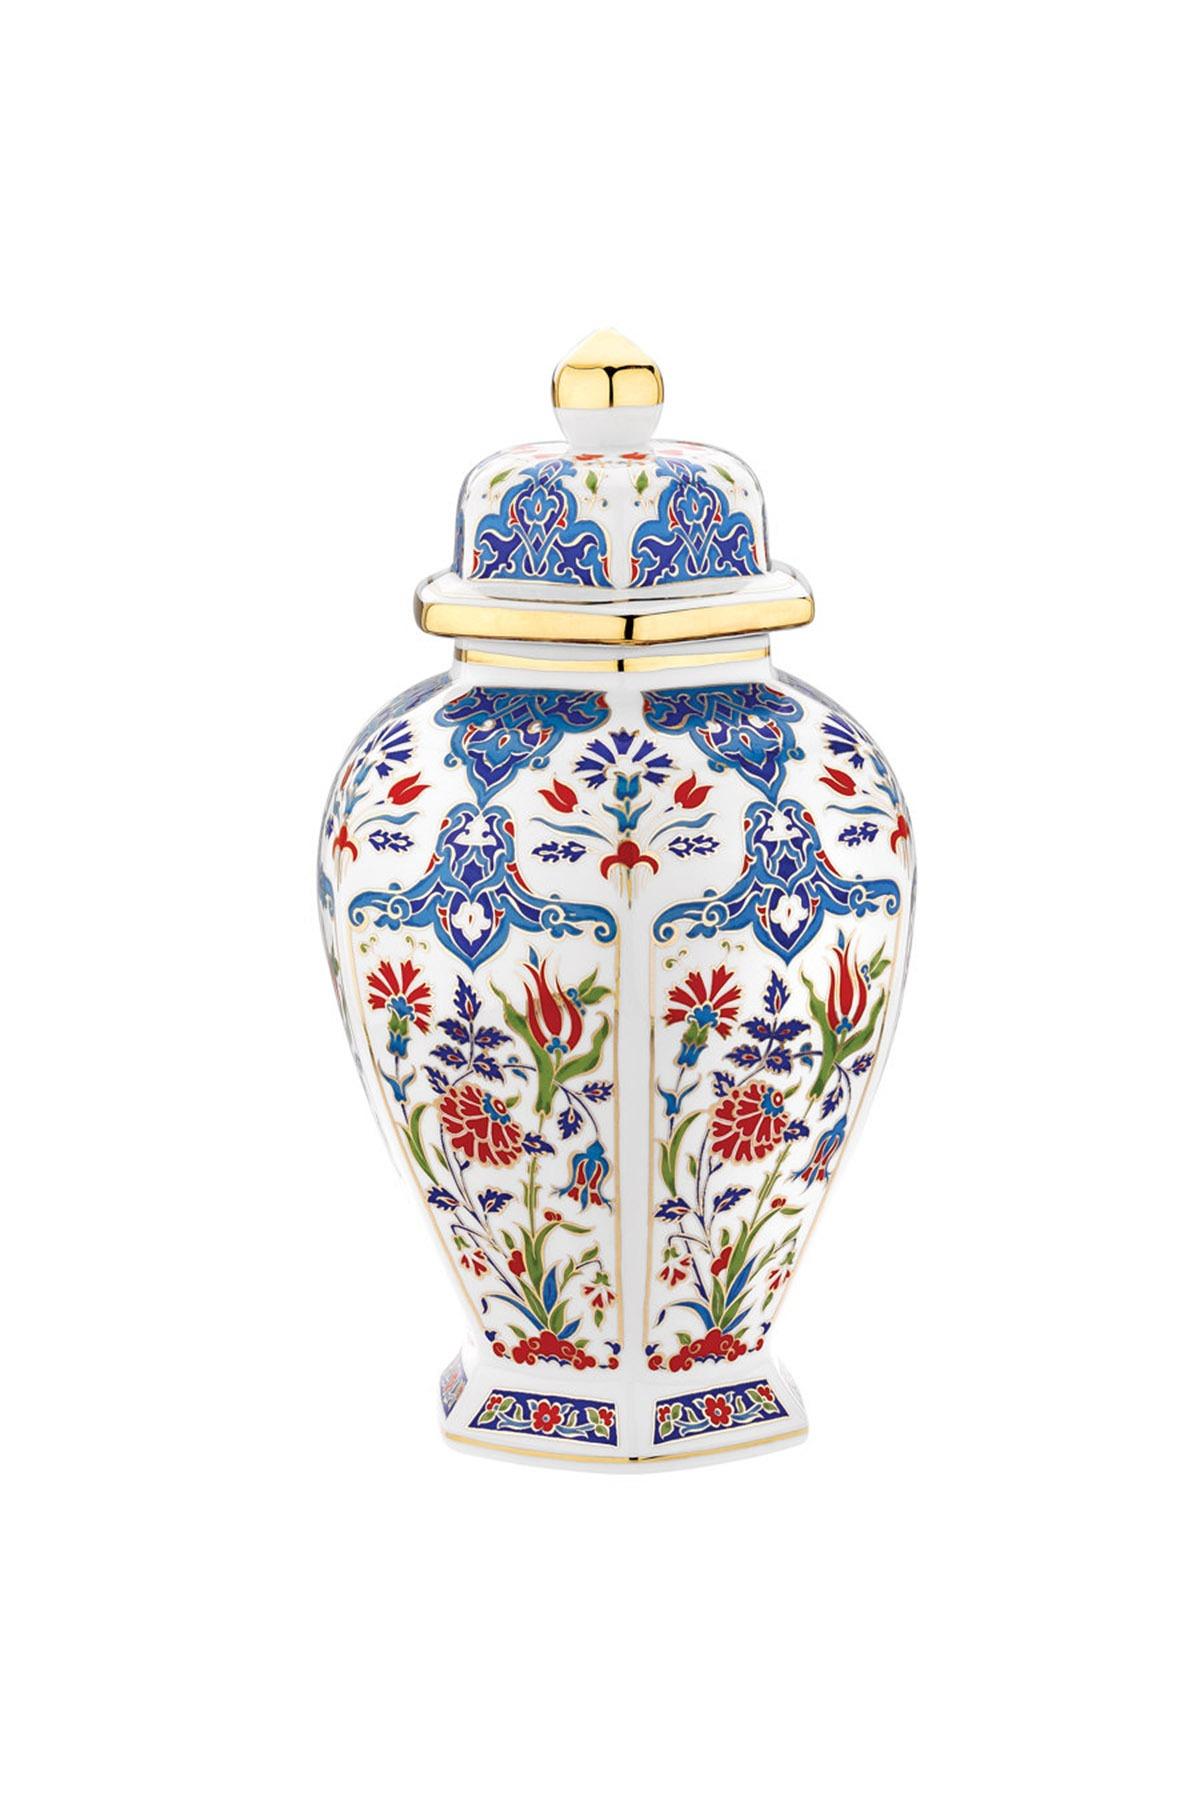 Kütahya Porselen - Kütahya Porselen Sırküpü Kavanoz 30 Cm Dekor No:415